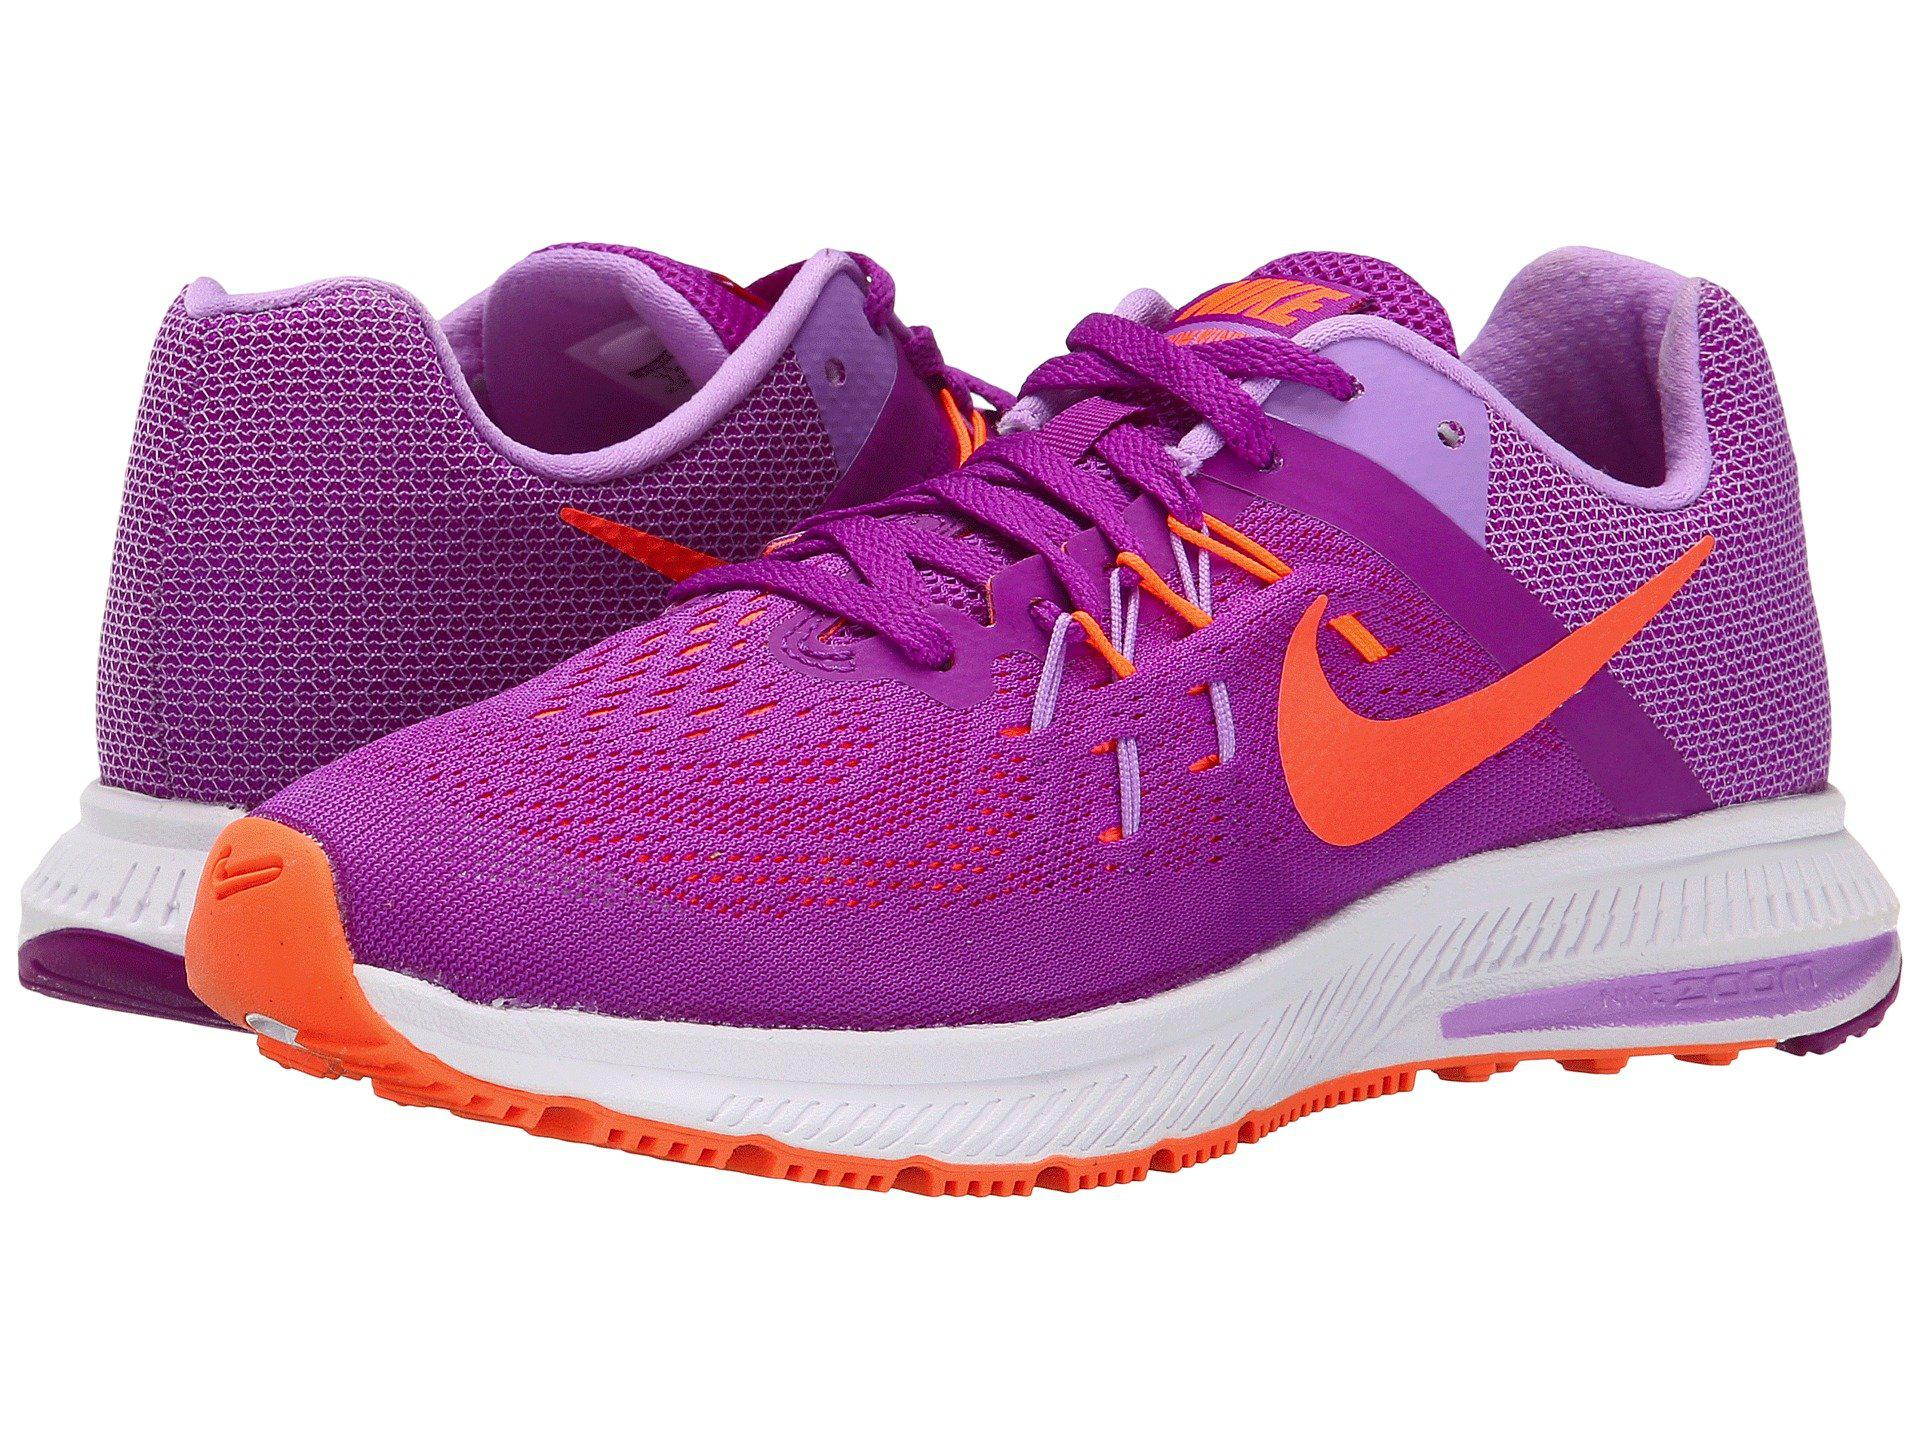 ae959c235d4e0a ... discount code for nike. womens purple zoom winflo 2 203ce 5a179